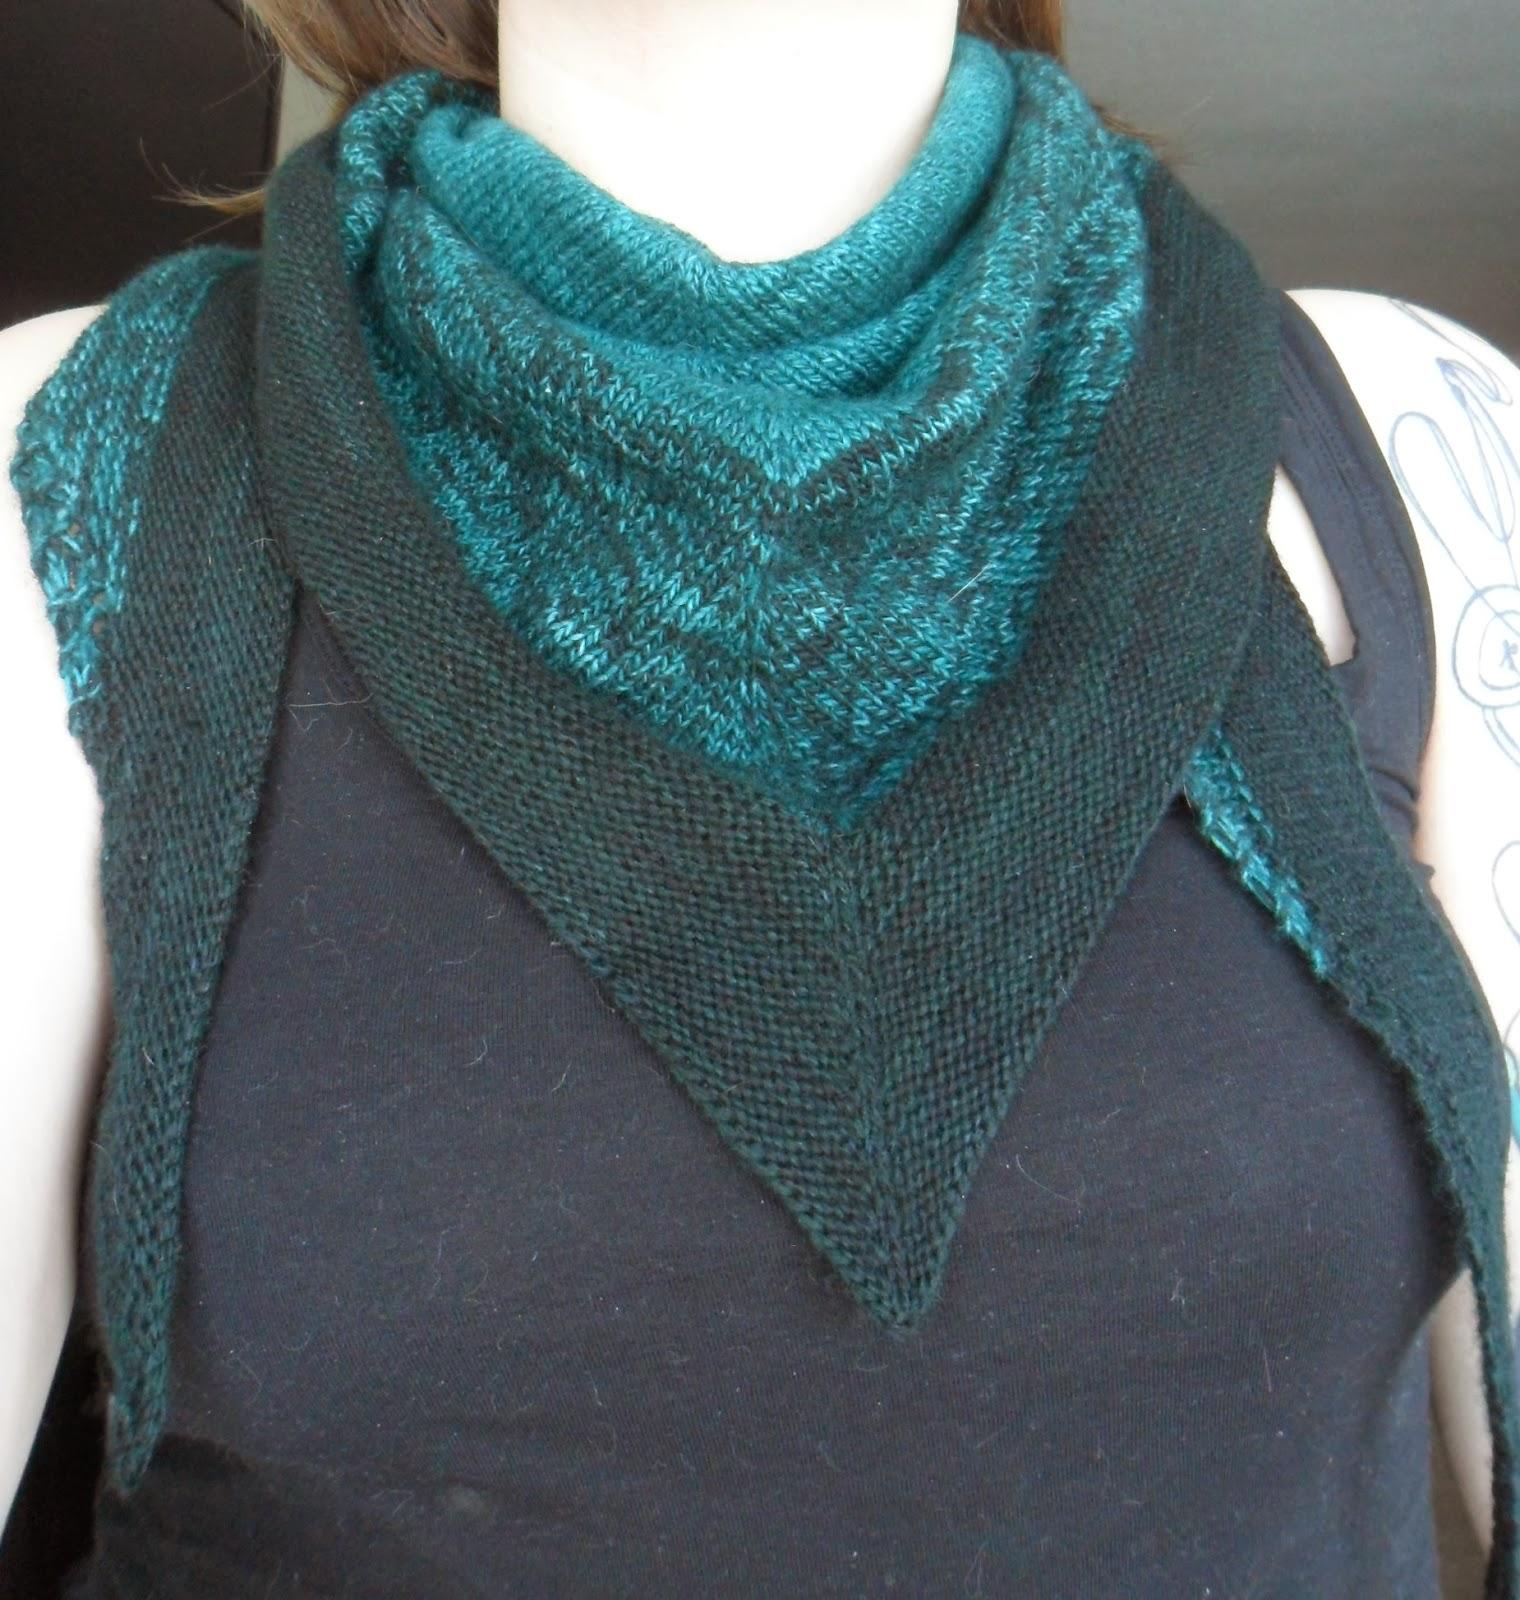 http://www.ravelry.com/projects/craftyminou/spring-kerchief